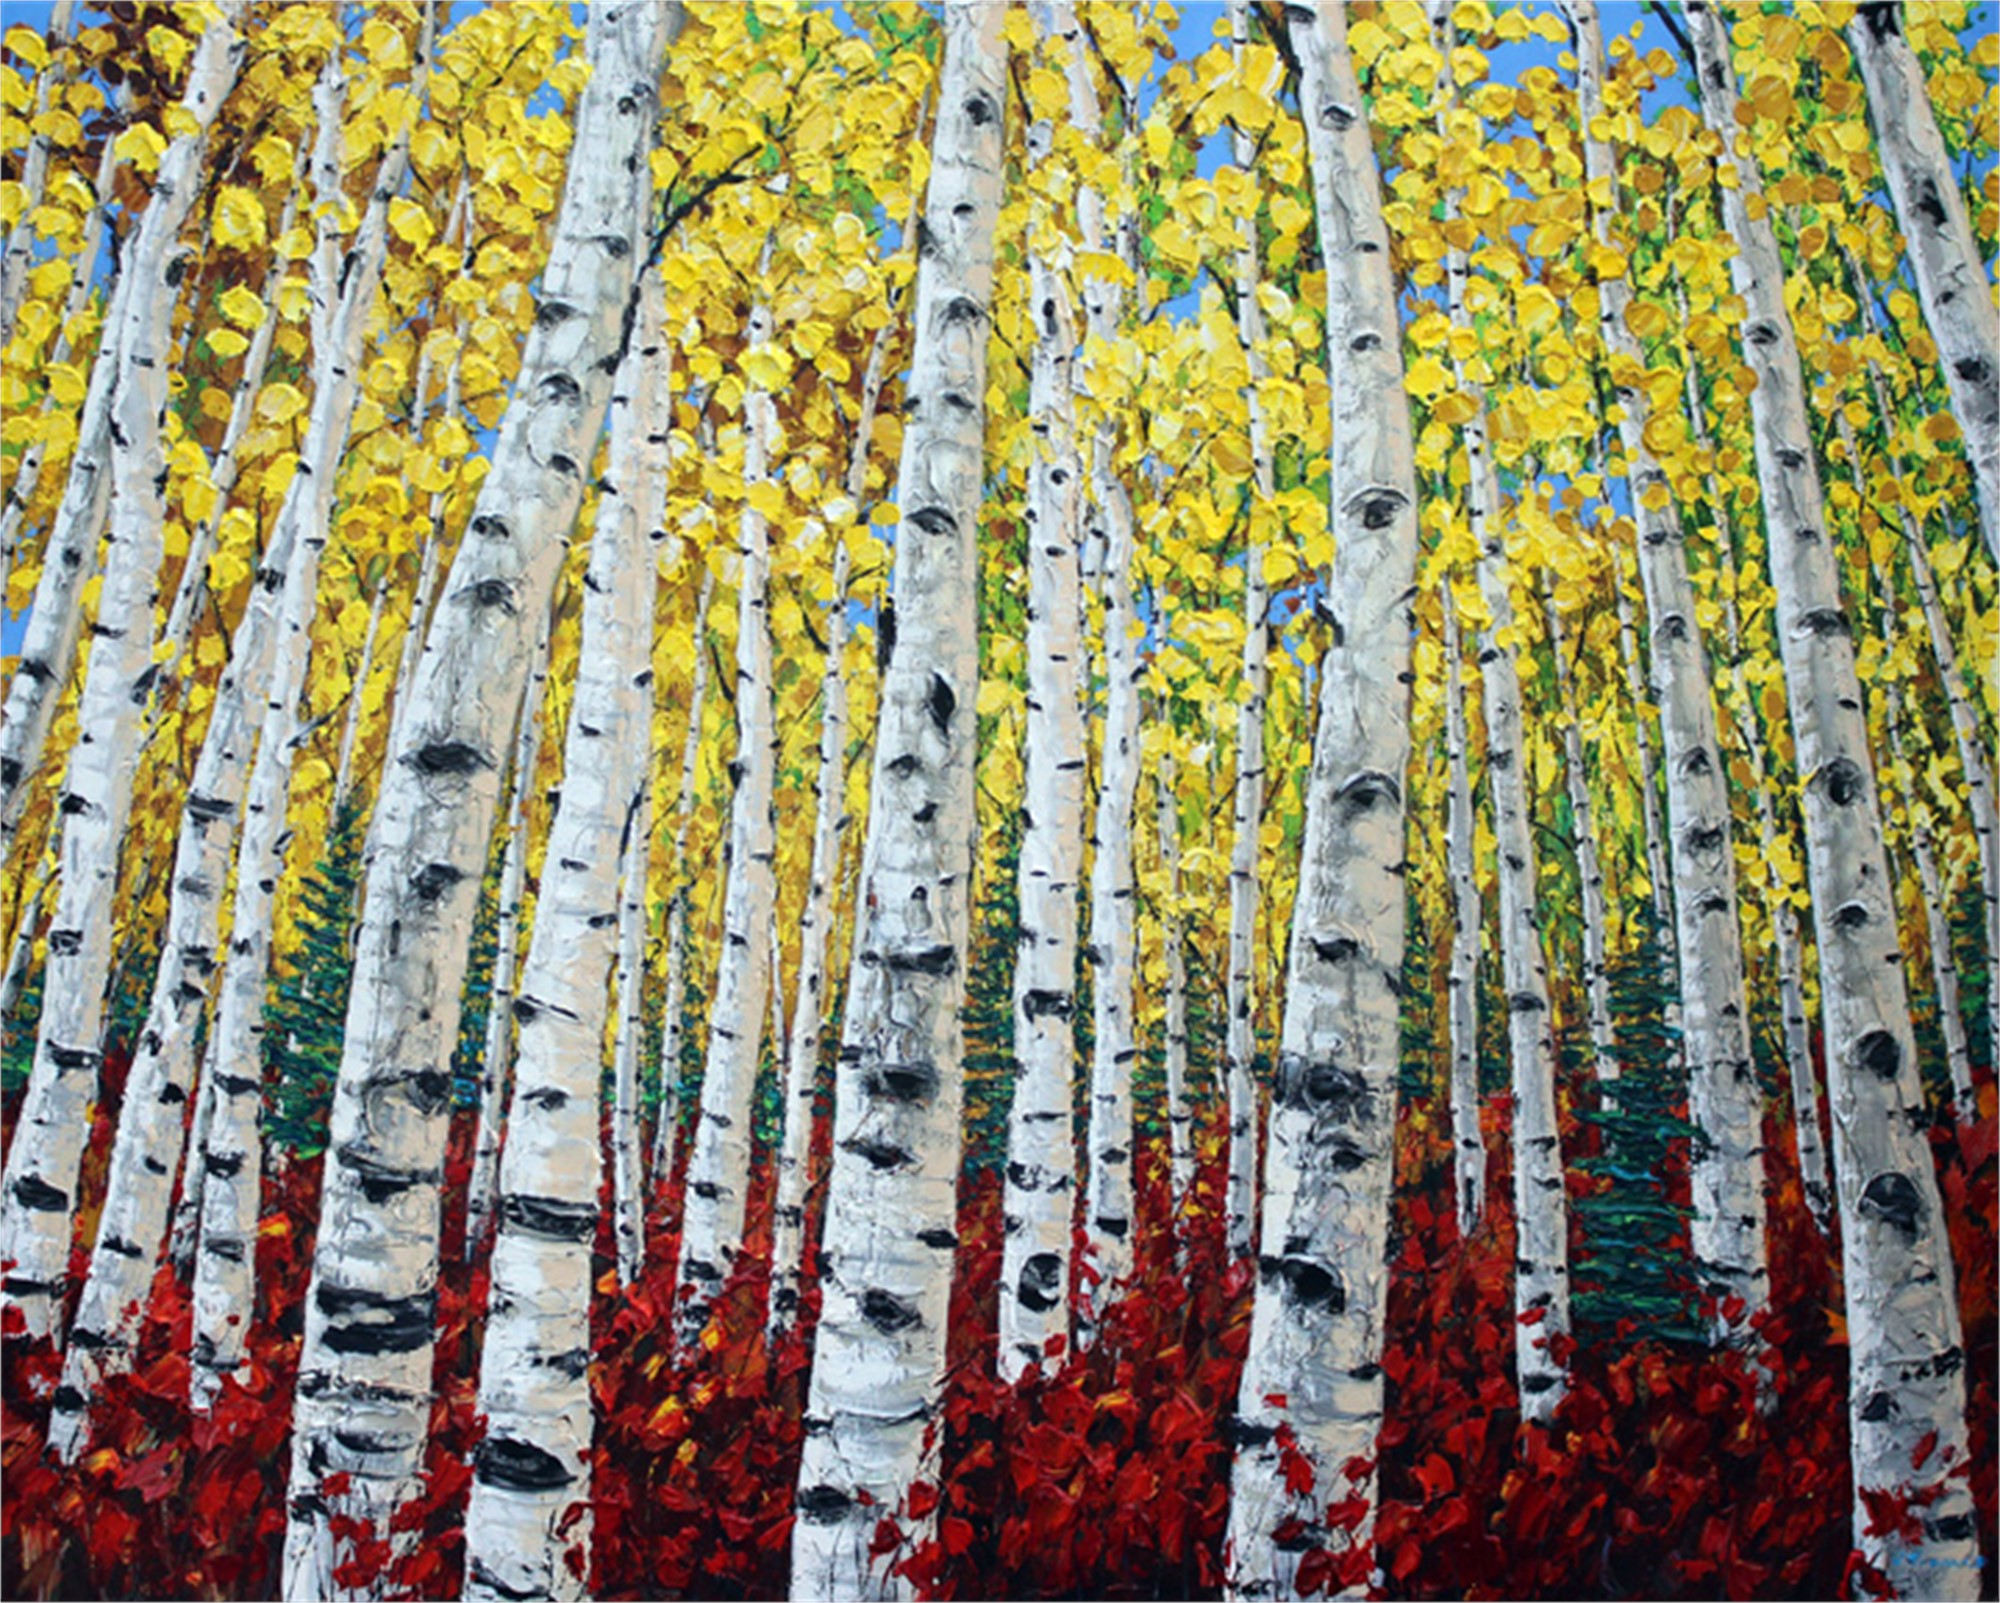 Autumn's Song by Jennifer Vranes